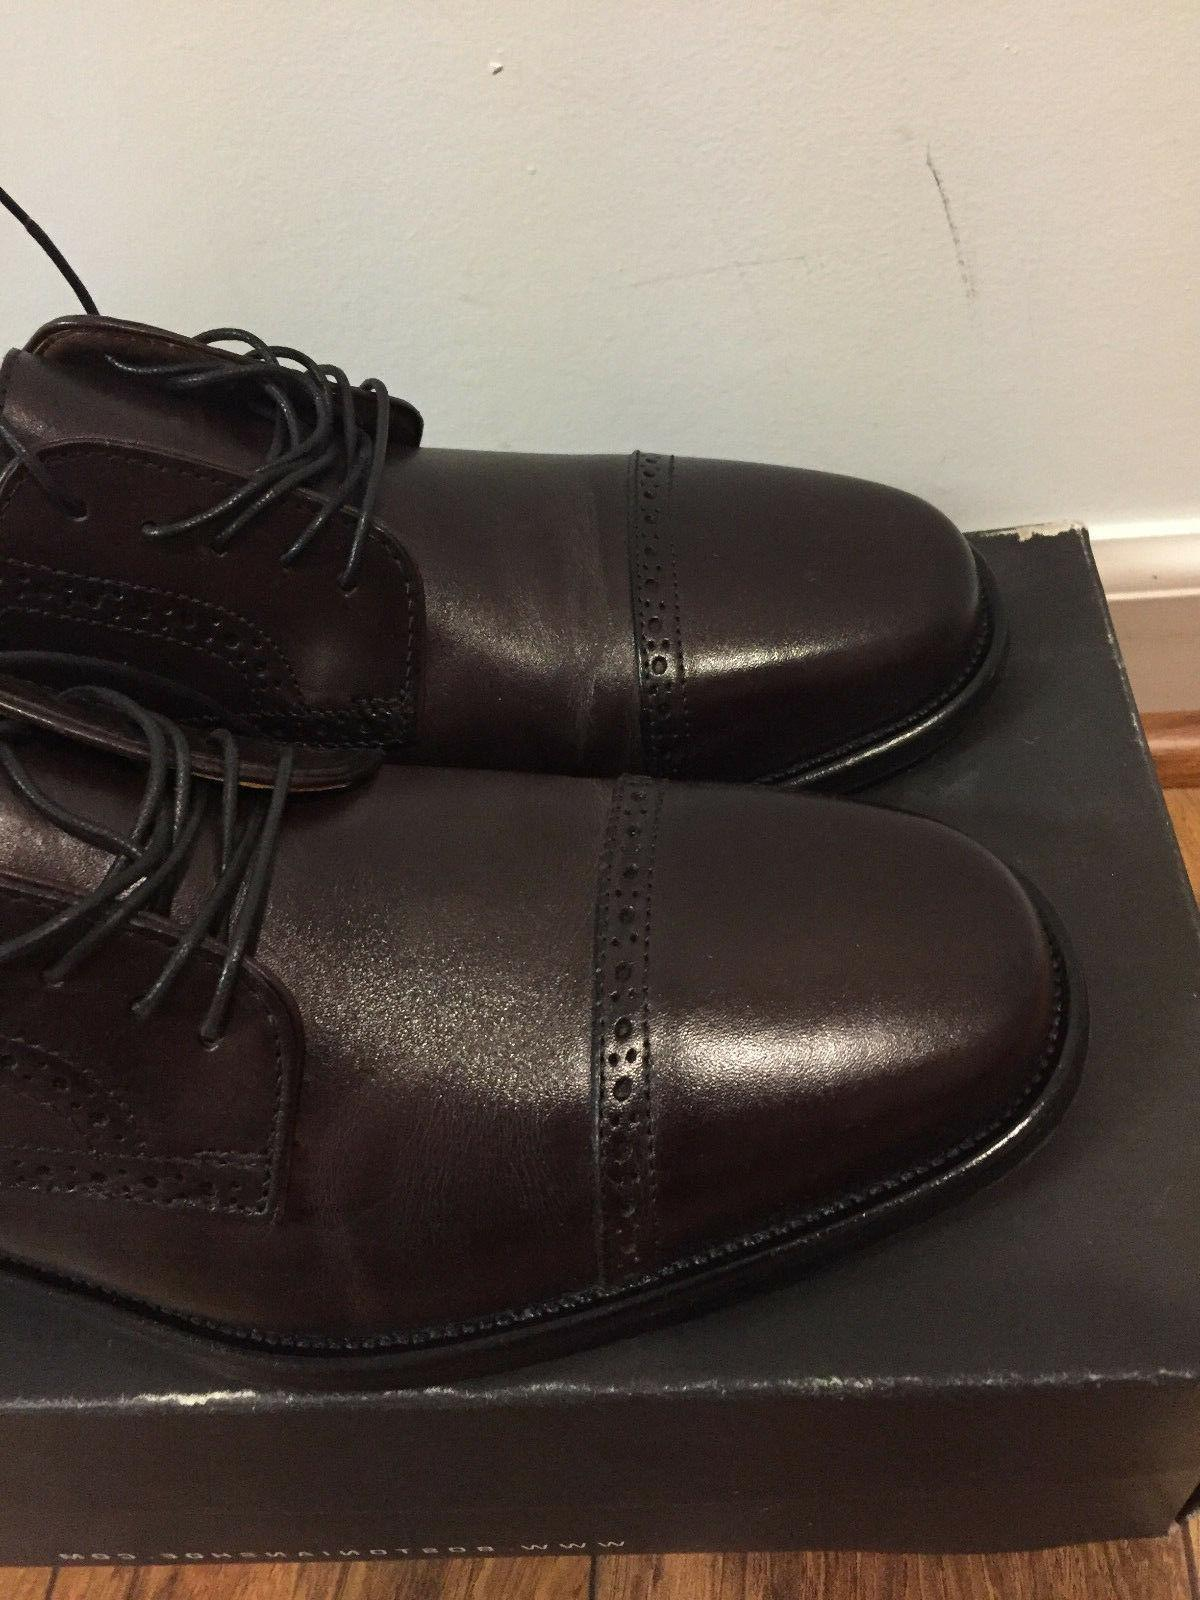 Bostonian Burgundy Leather Oxford Dress 24017,